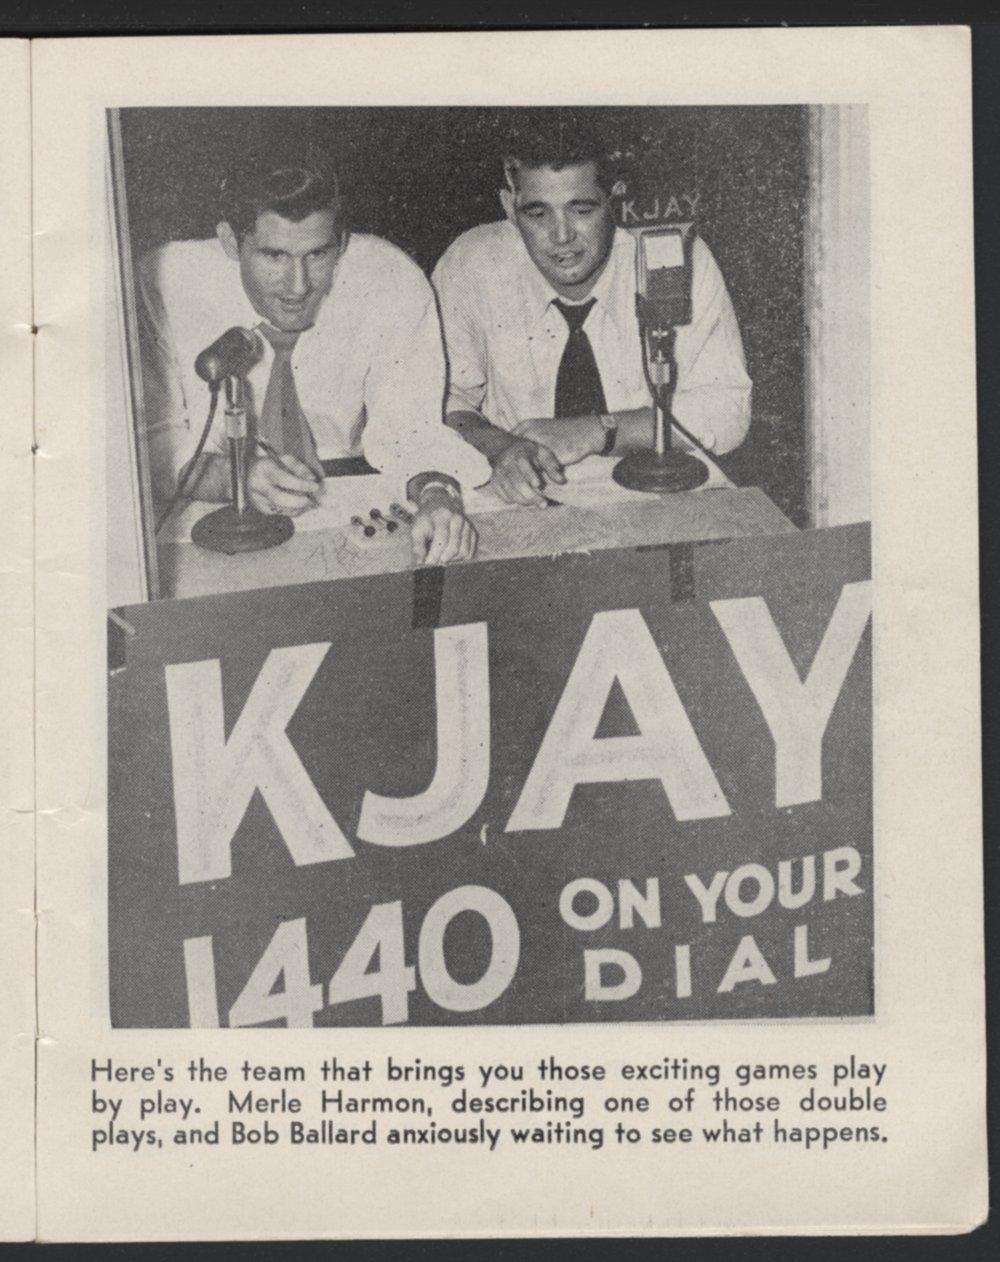 Meet your baseball players on KJAY - 3